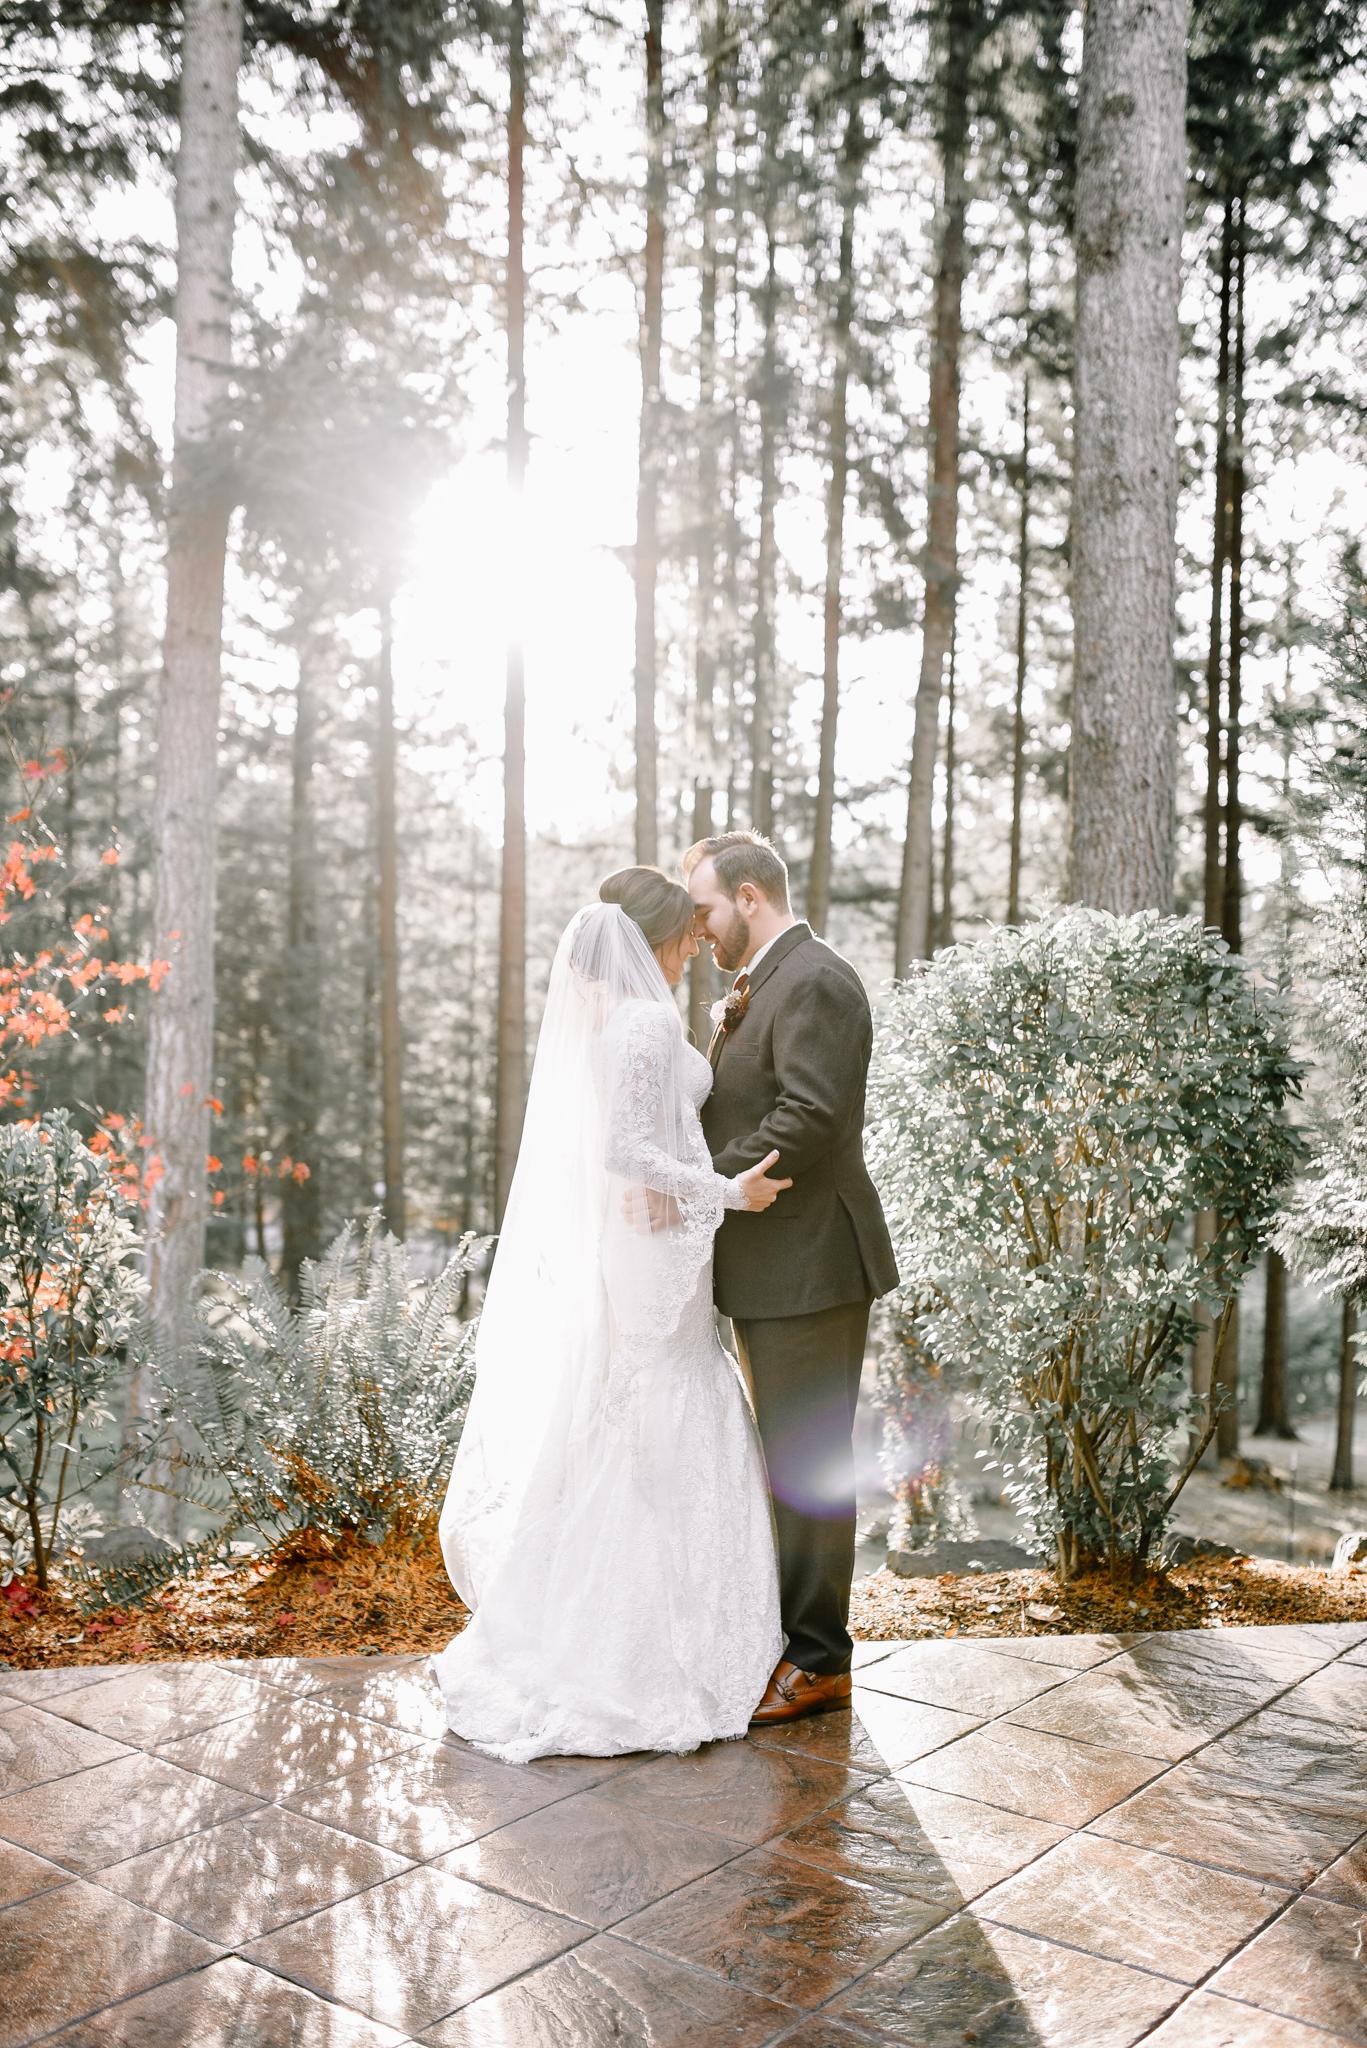 Manu and Laura - Portland Wedding Photographer - 22.jpg